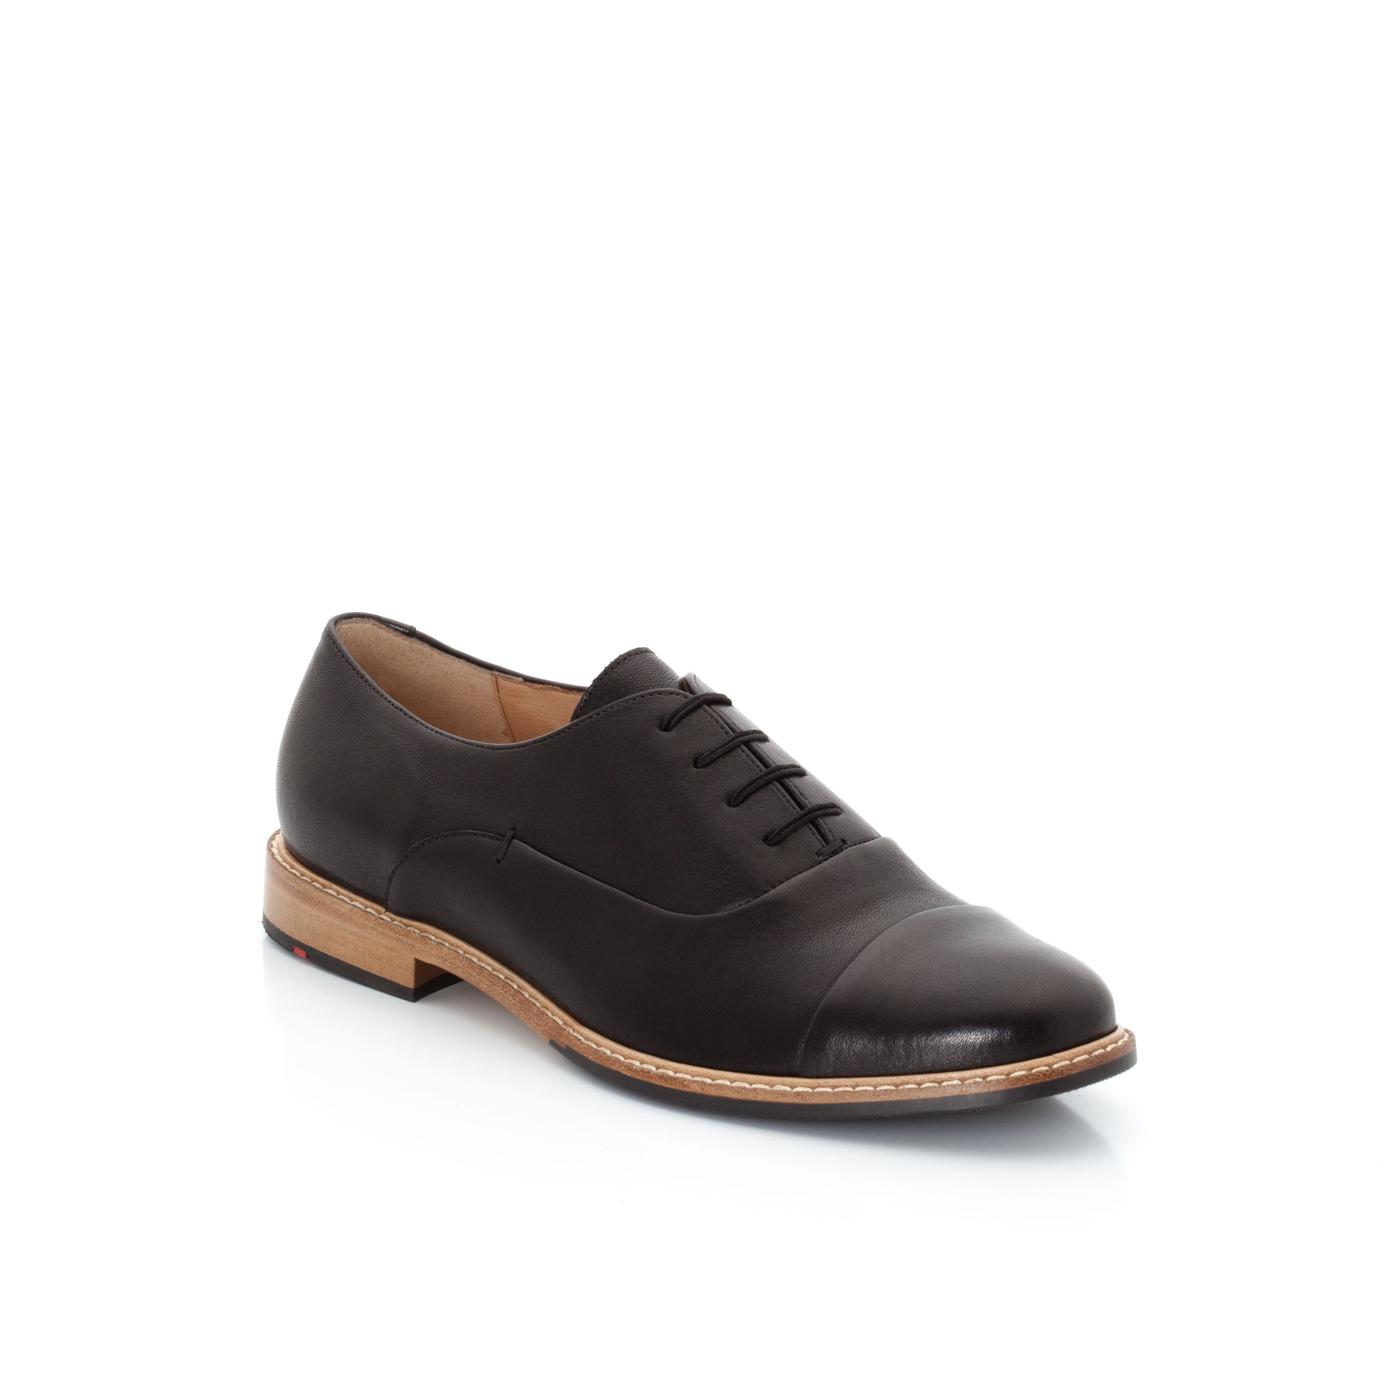 Halbschuhe | Schuhe > Boots | Schwarz | Glattleder -  leder | LLOYD